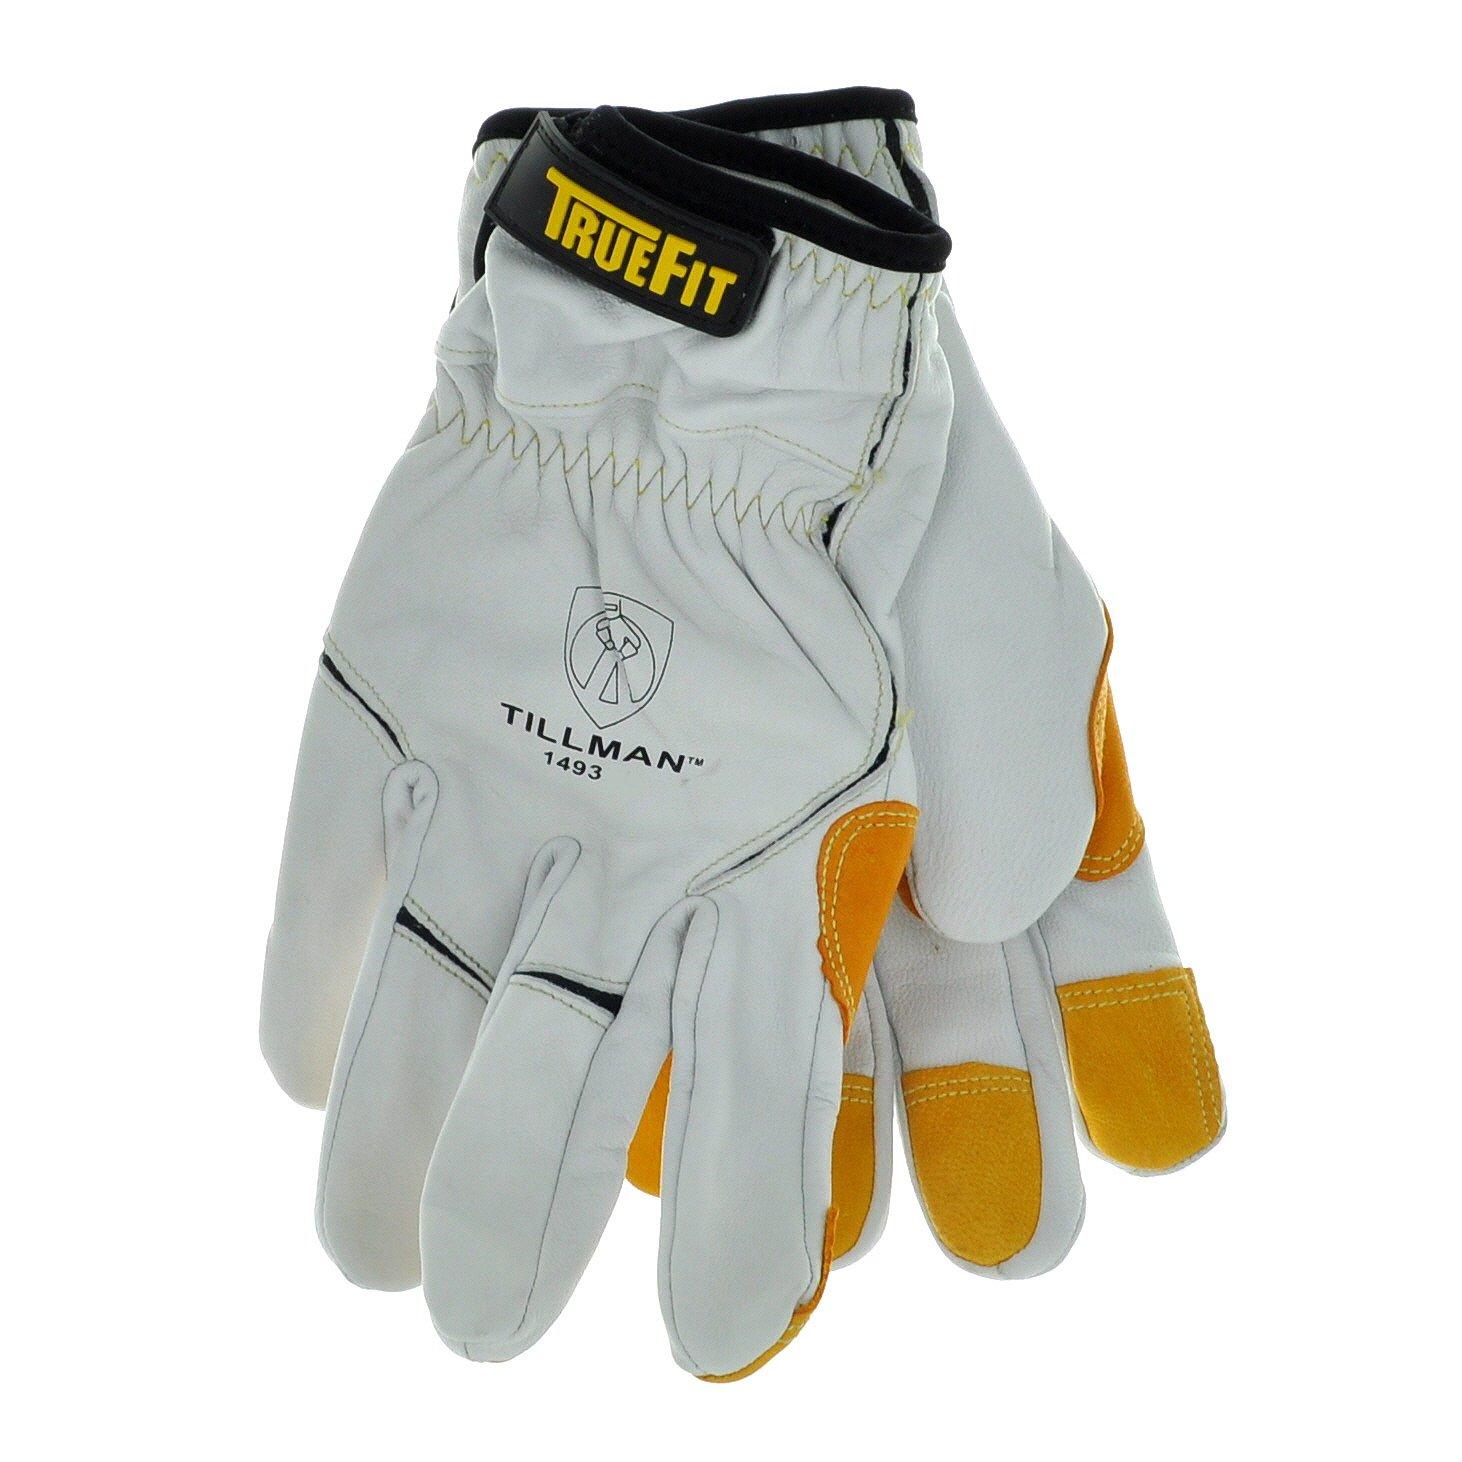 Tillman leather work gloves - Tillman 1493 Super Premium True Fit Top Grain Goatskin Kevlar Gloves Amazon Com